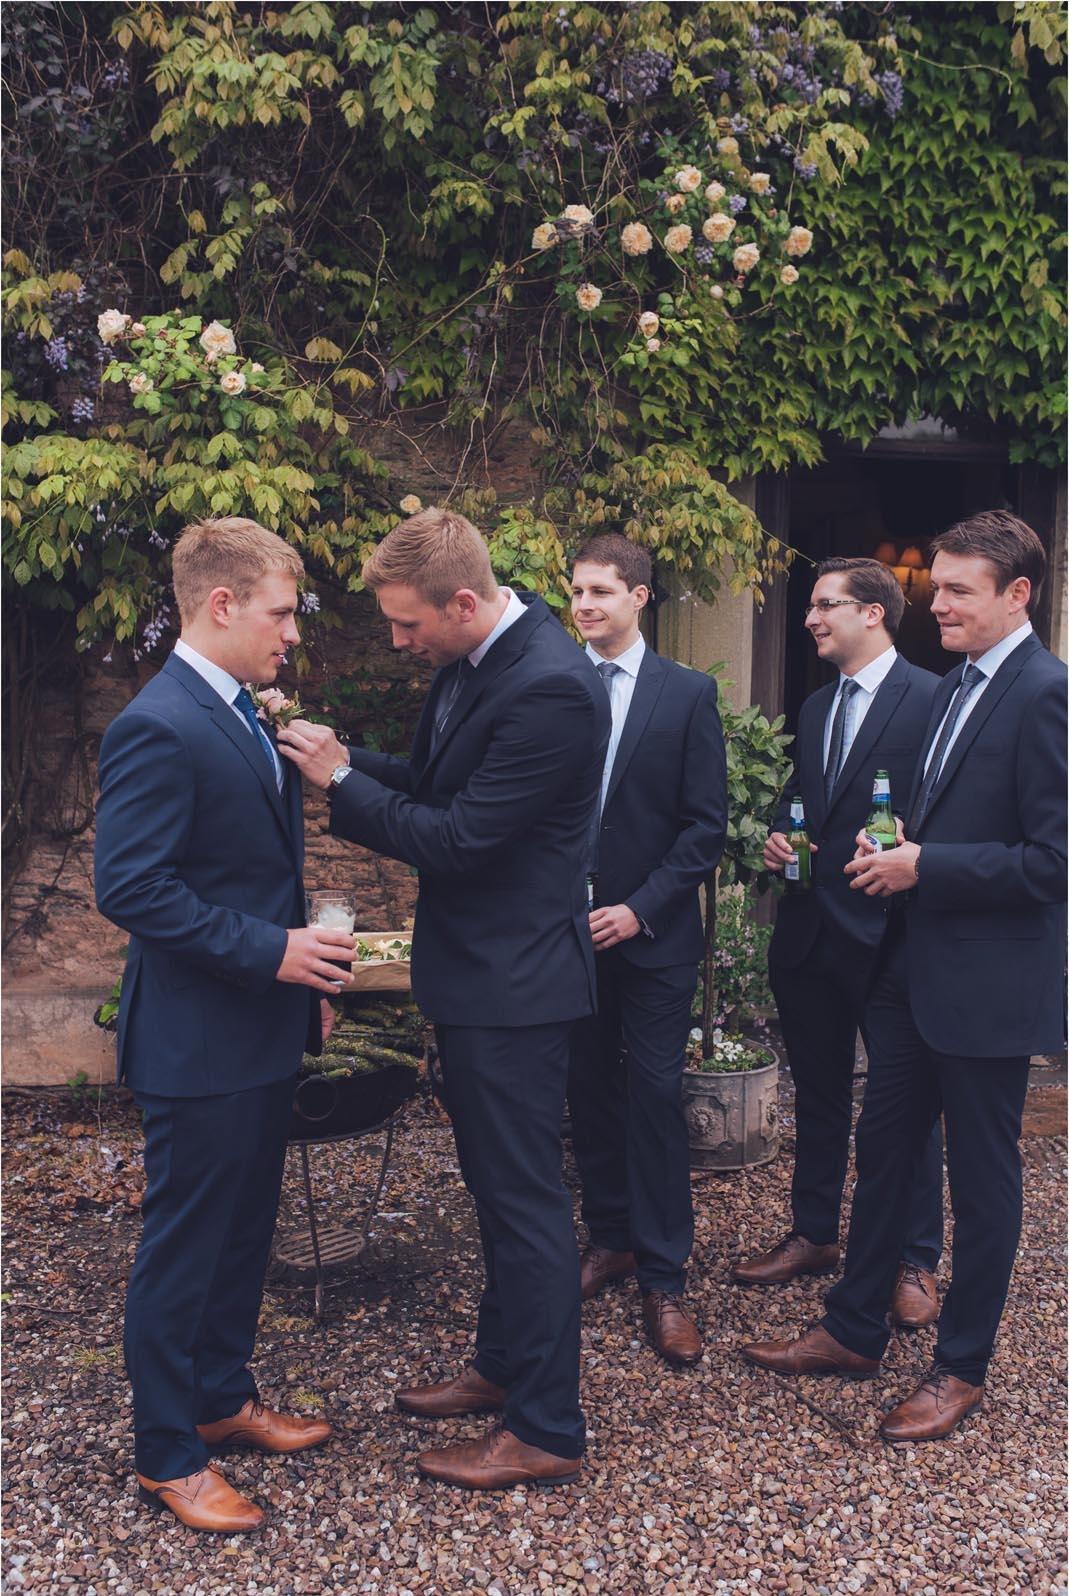 Simon biffen wedding photography 0030